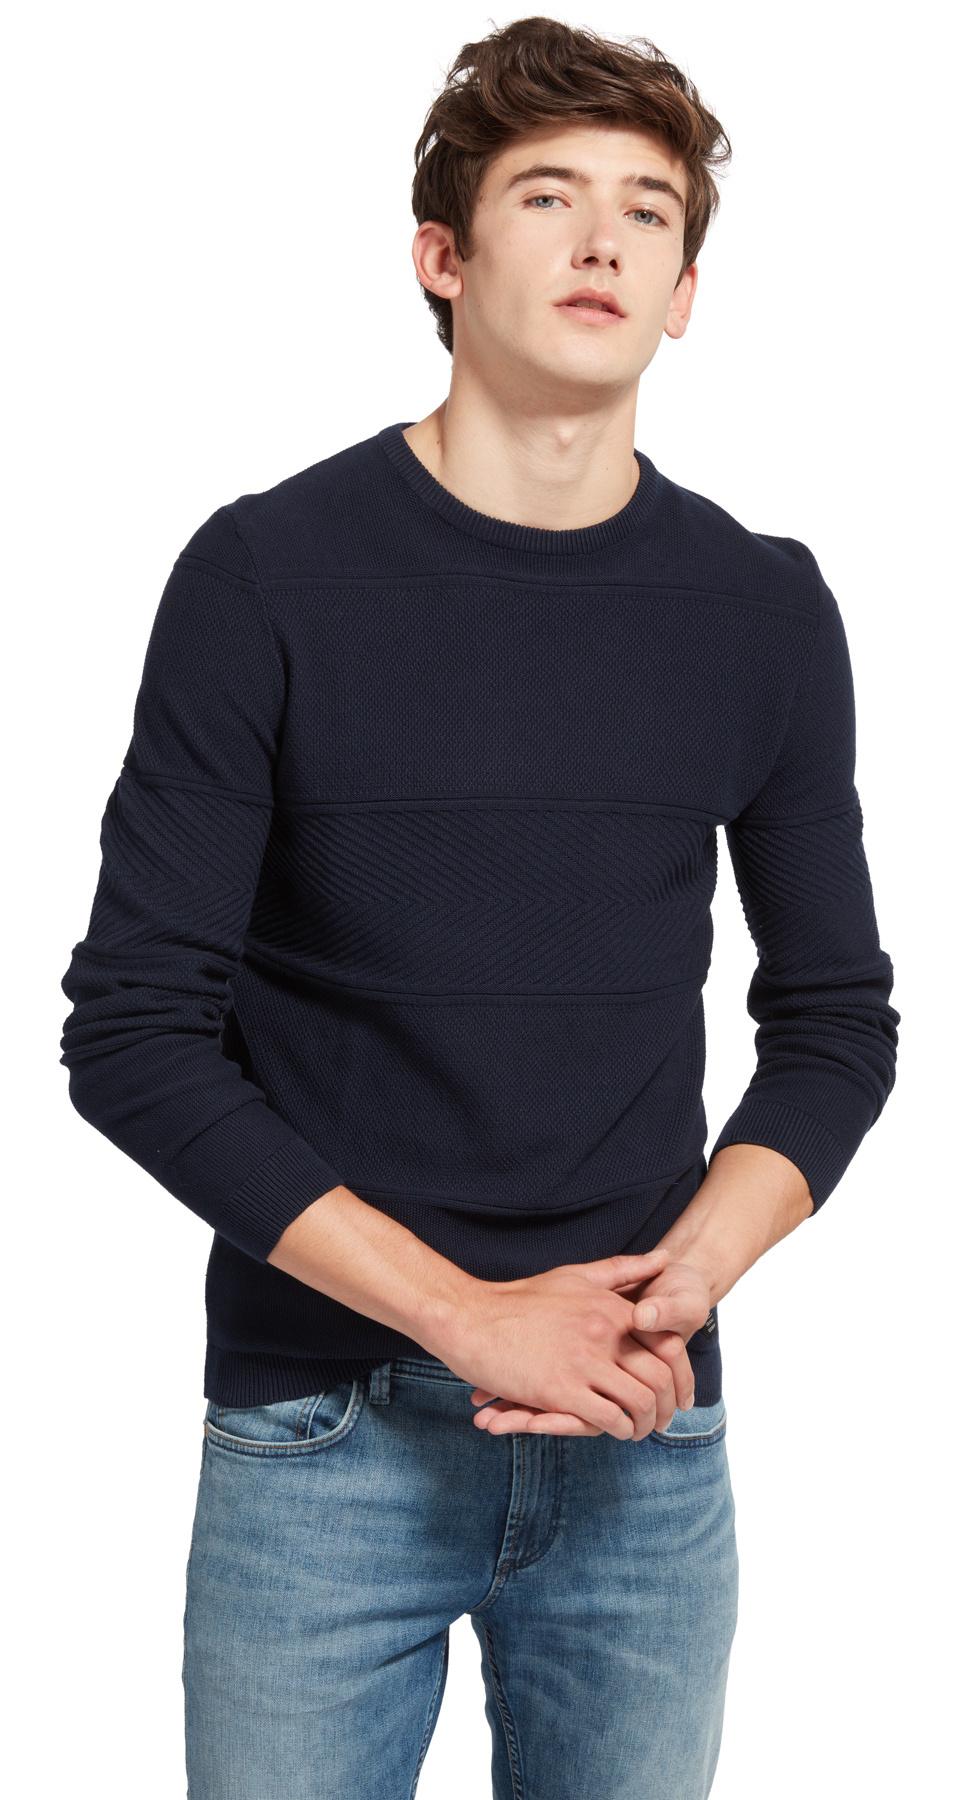 Tom Tailor Denim pletený svetr 30550170010/6800 Modrá XL